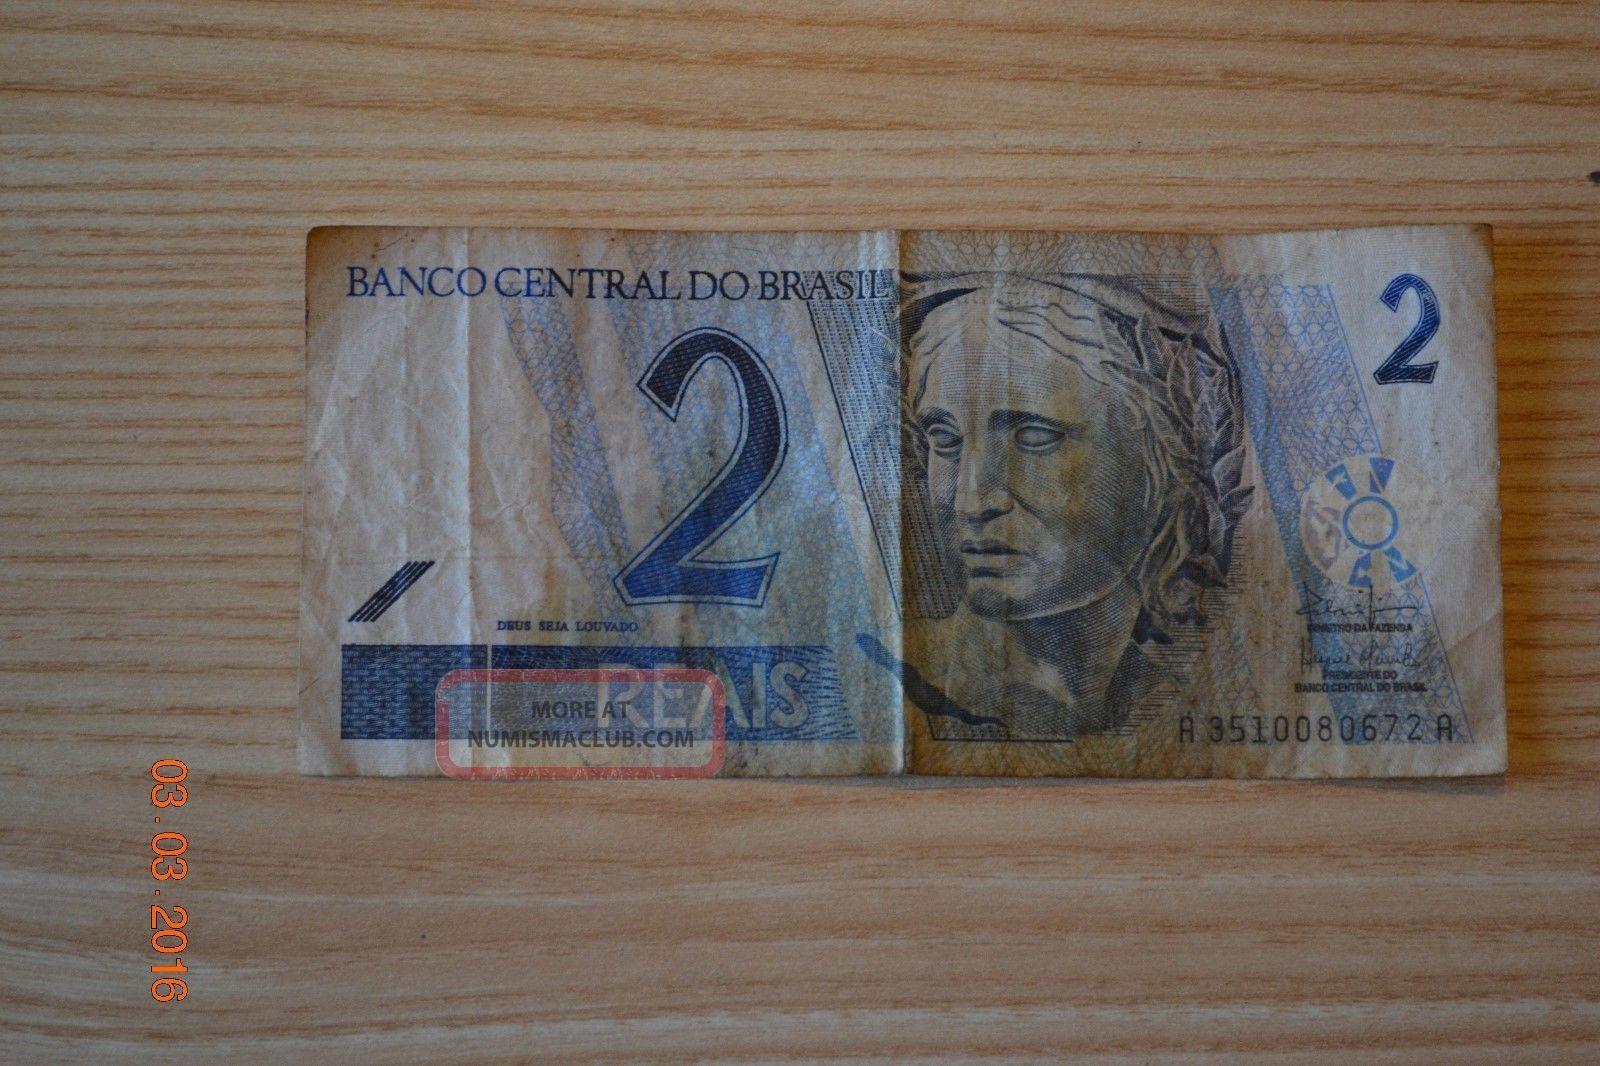 Banco Central Do Brasil (2) Dois Two Reais